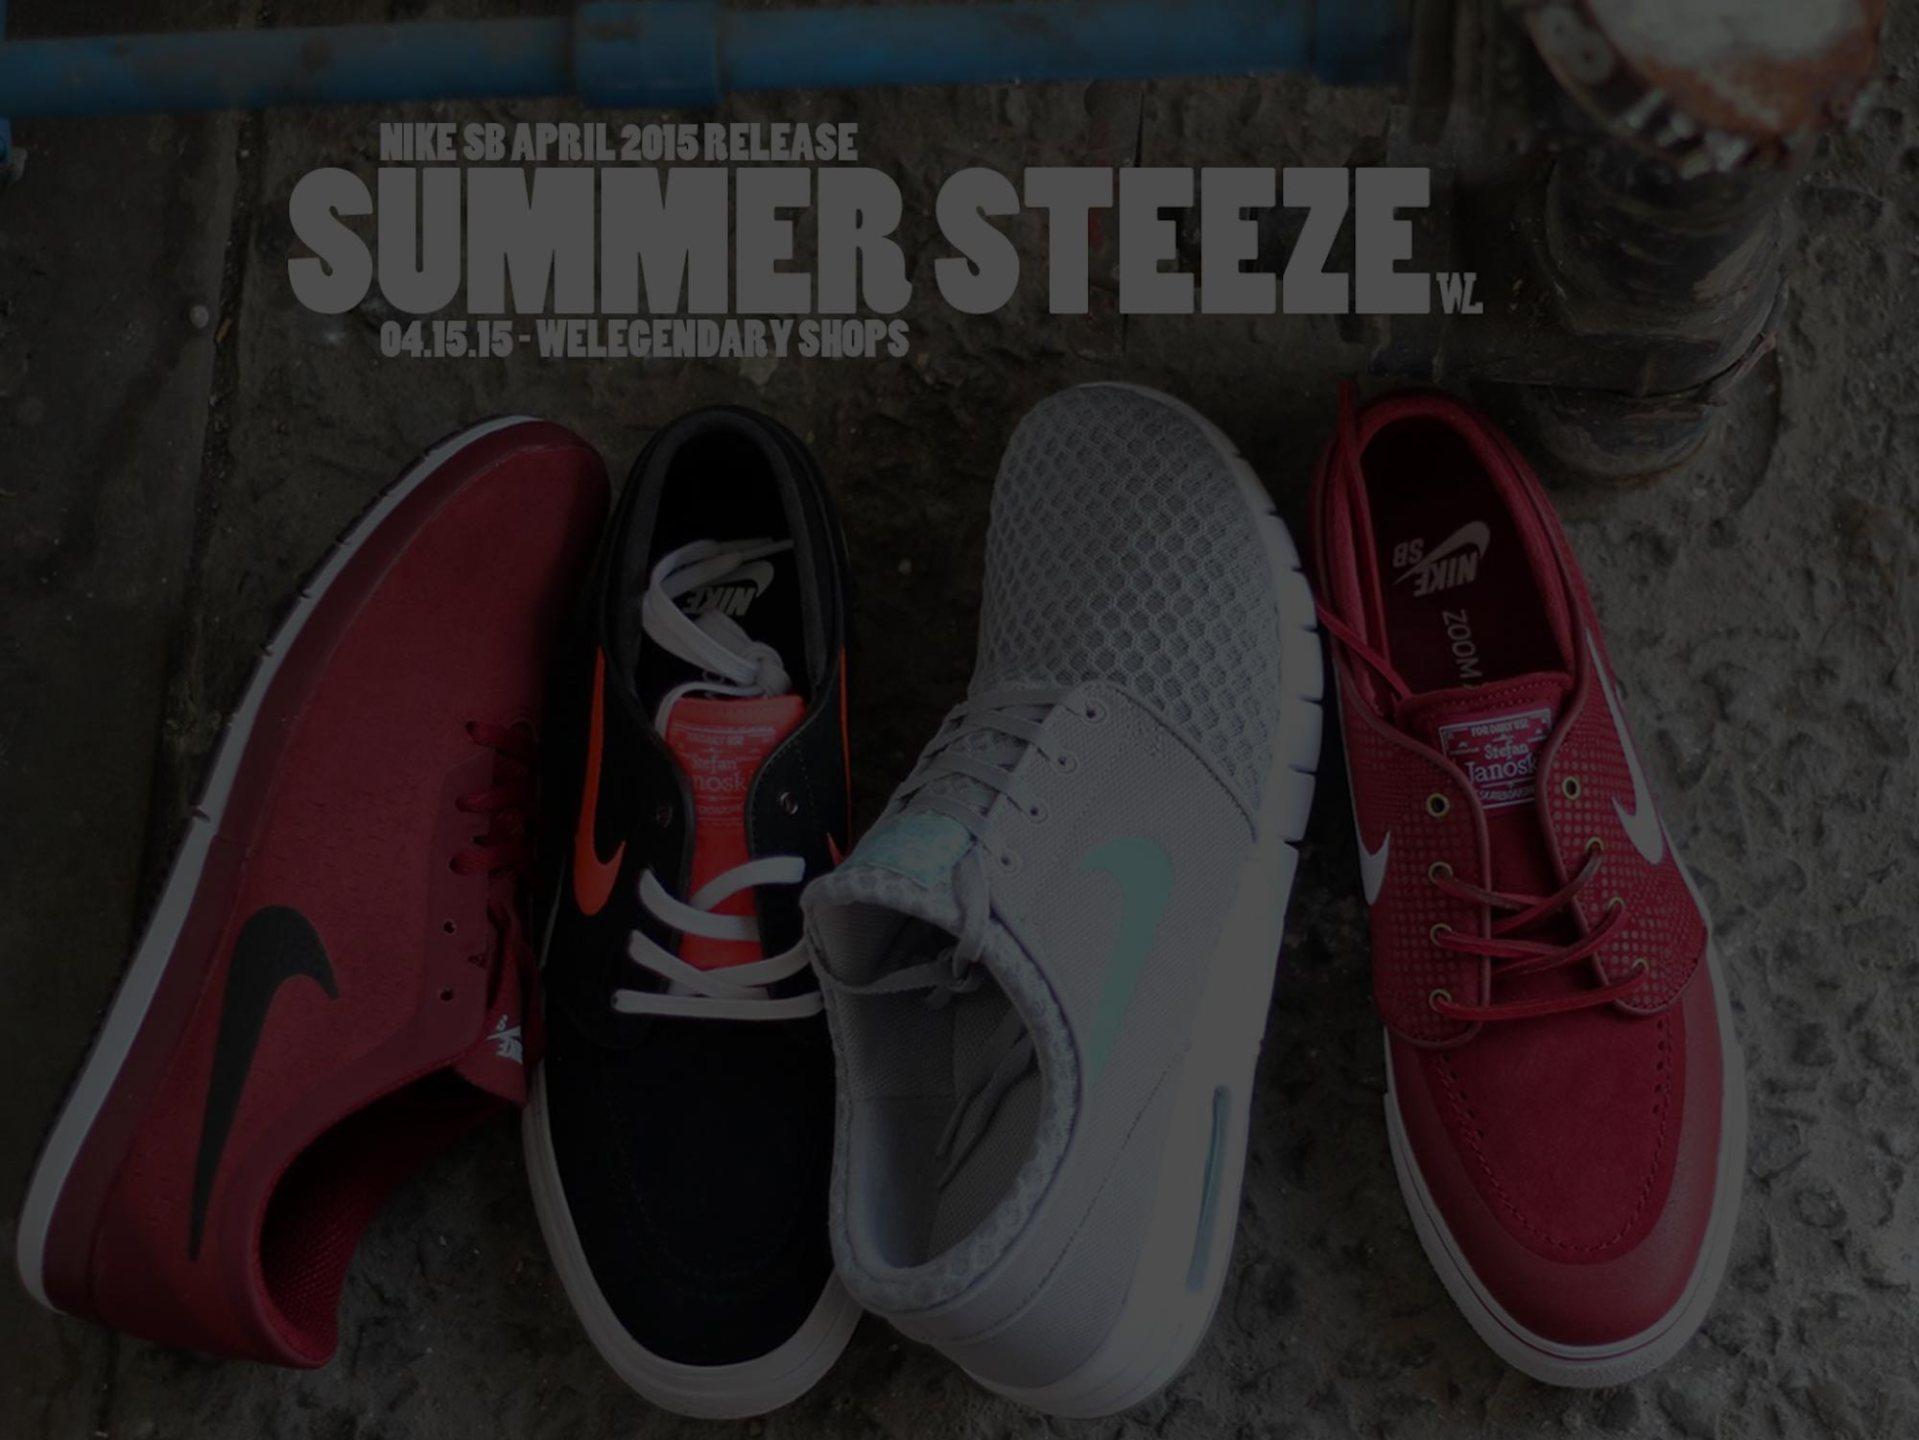 WeLegendary Nike SB April 2015 Releases